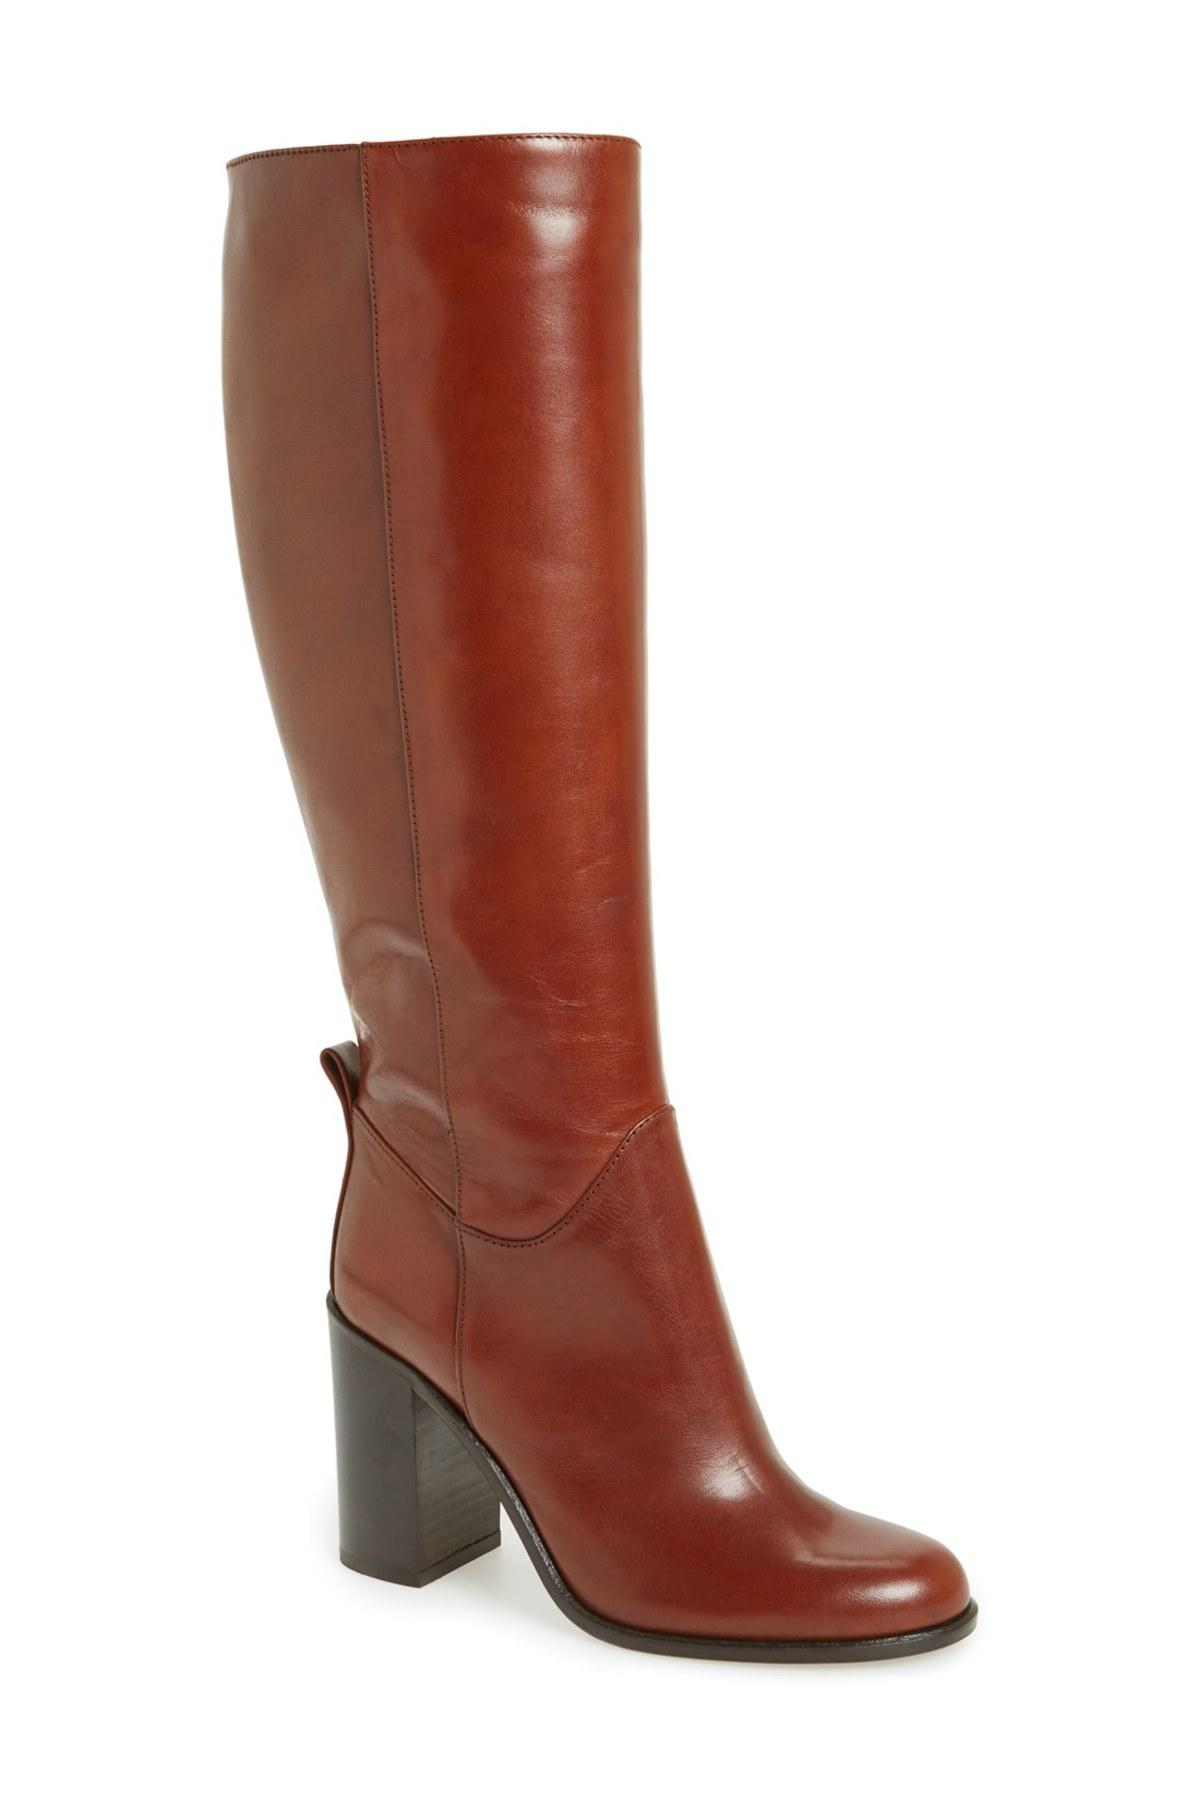 9b3999dc58b1 Lyst - Kate Spade Baina Tall Boot in Brown